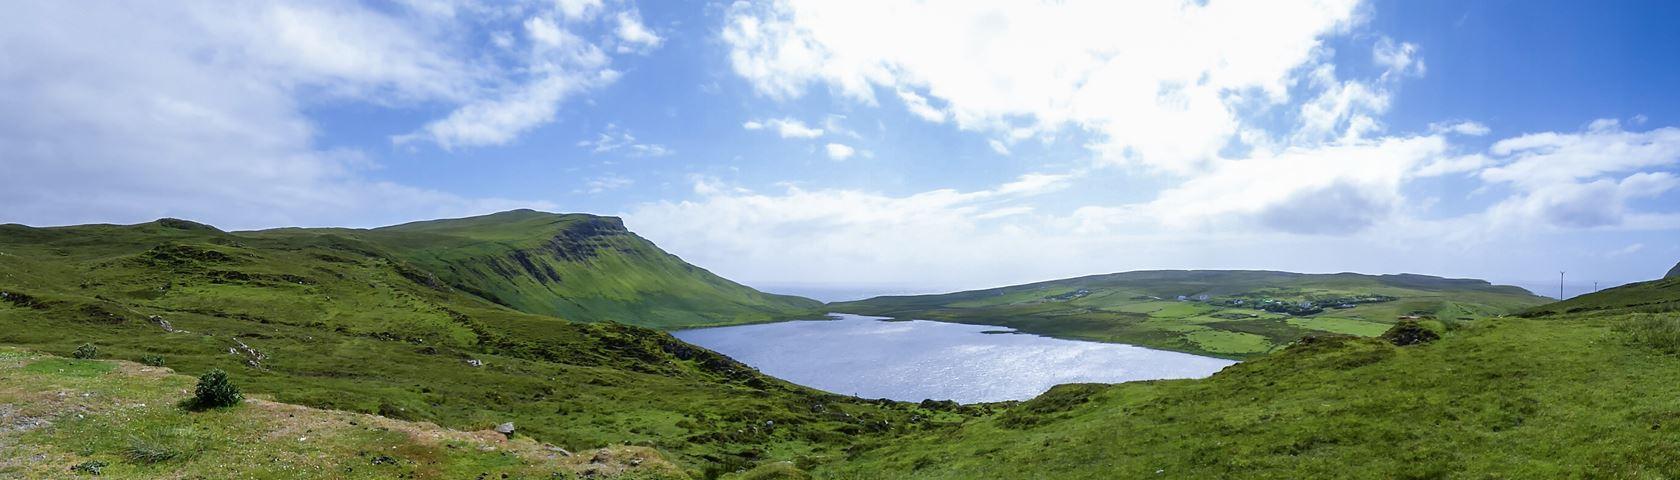 Isle of Skye Countryside